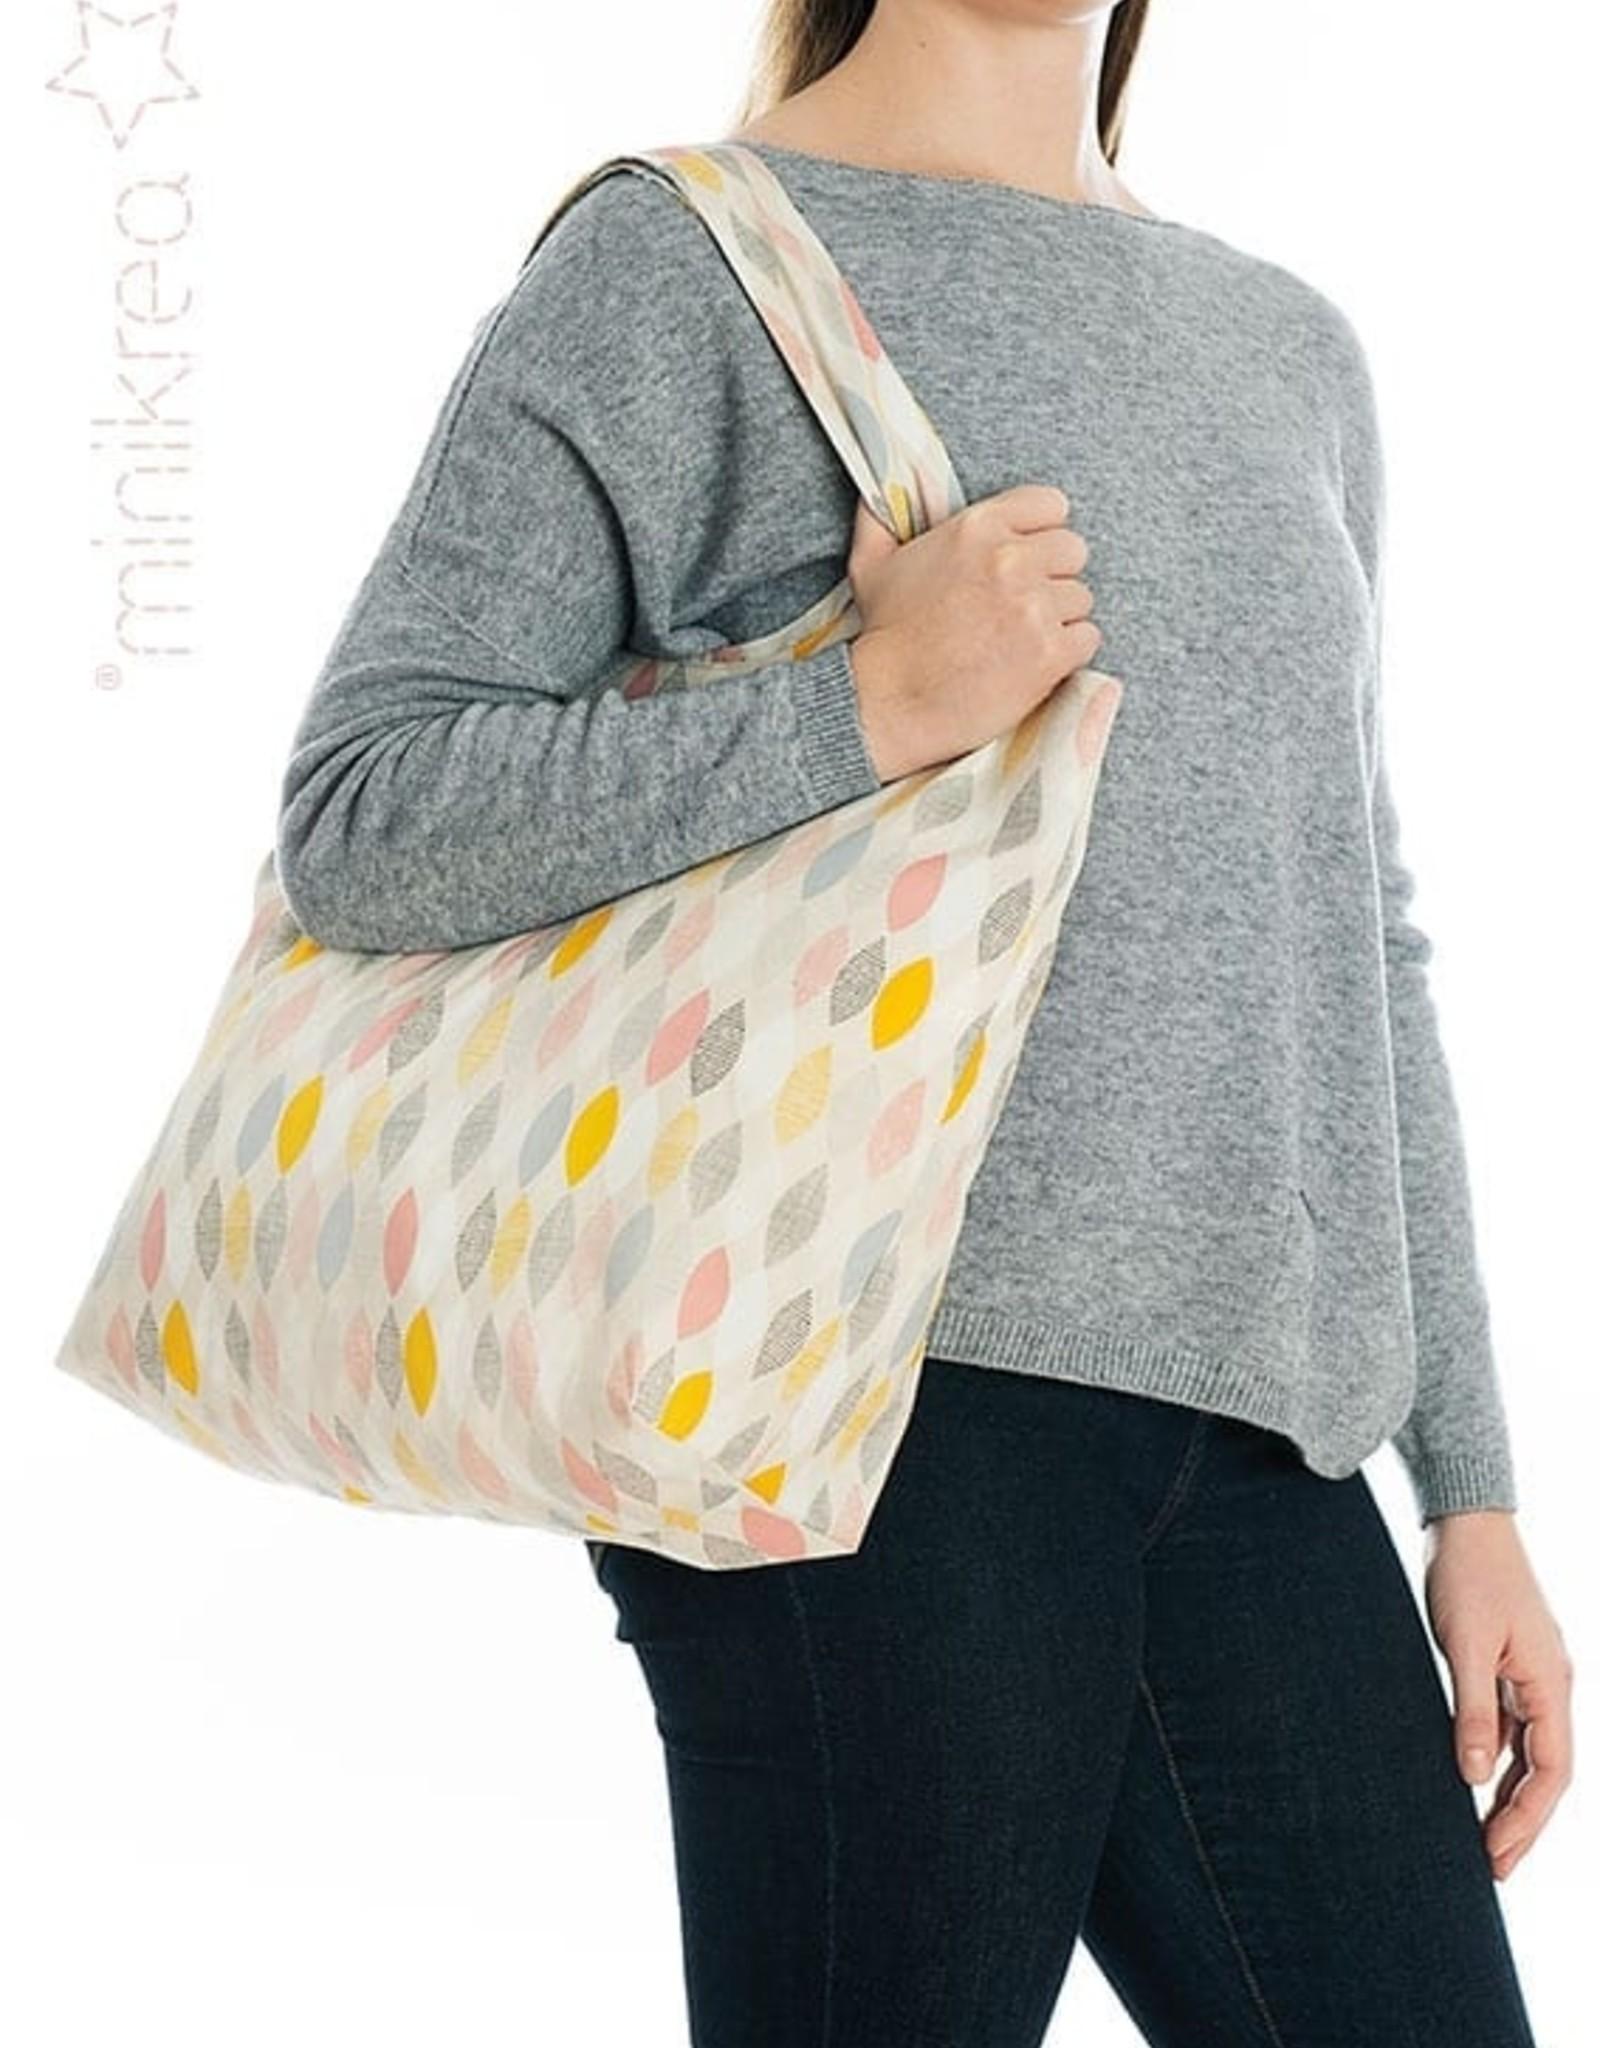 MiniKrea Patroon - Opvouwbare shopper